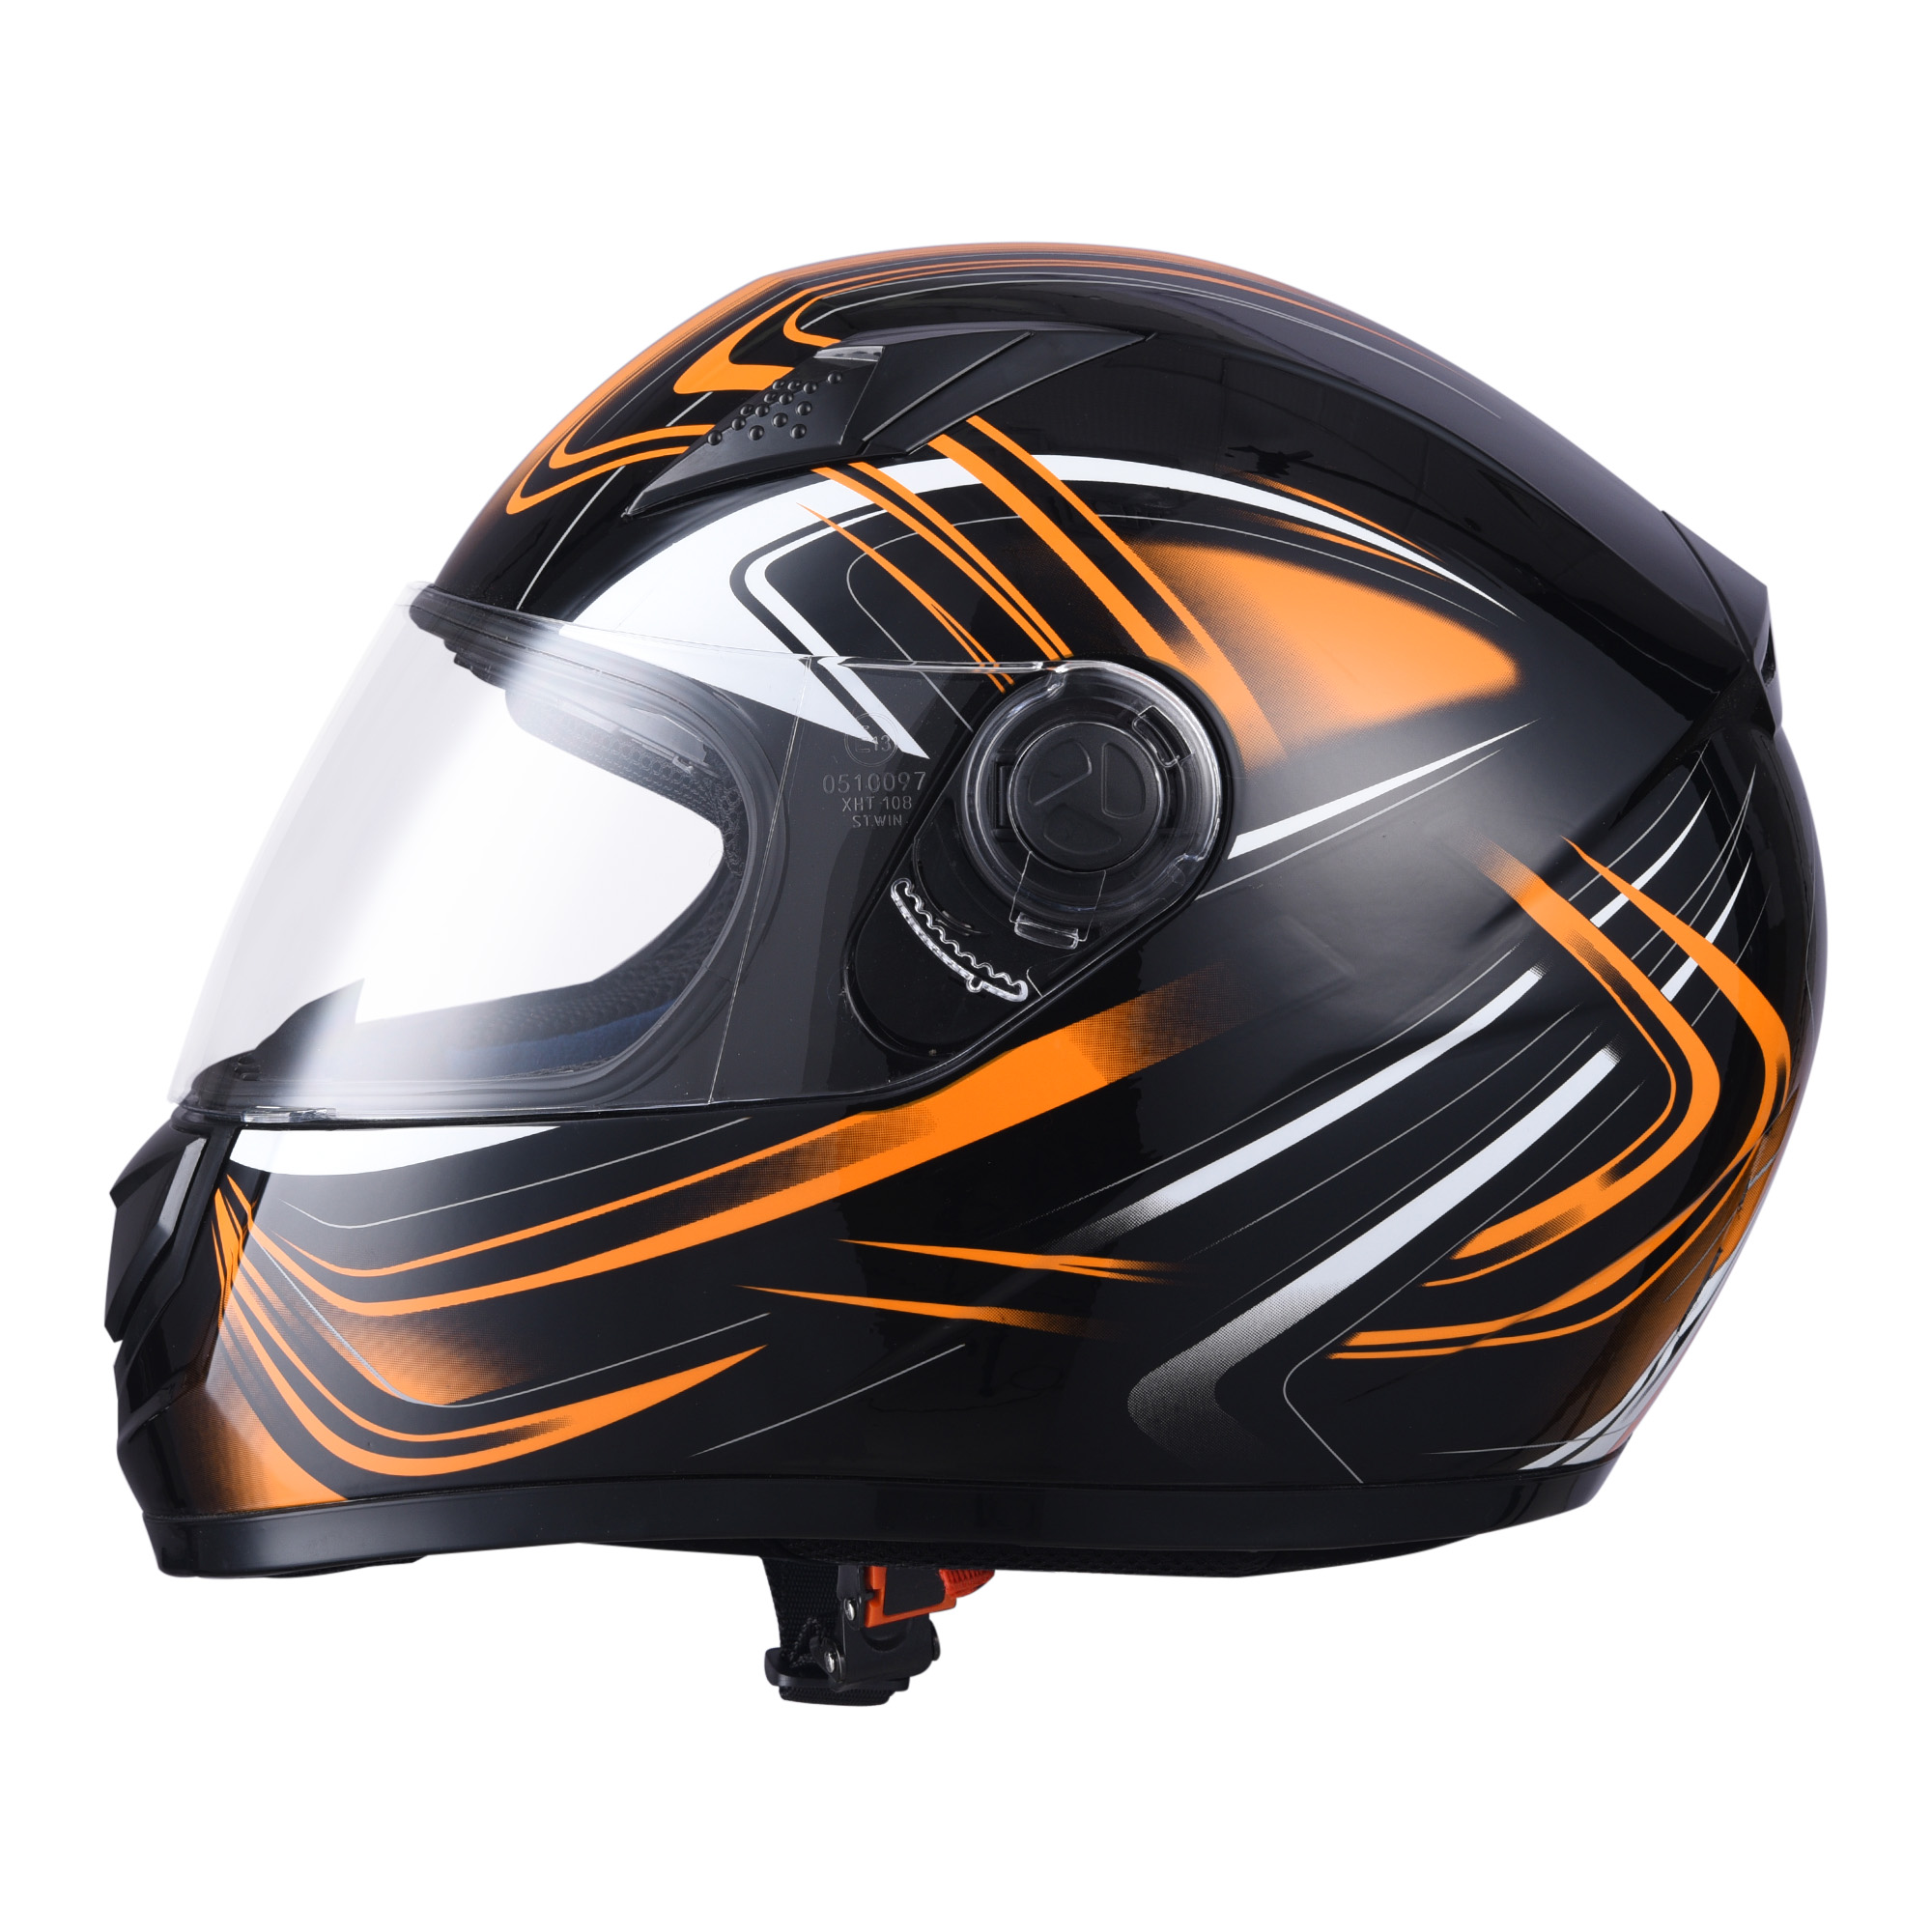 miniature 39 - AHR K12 Full Face Motorcycle Helmet DOT Air Vents Clear Visor Racing S M L XL